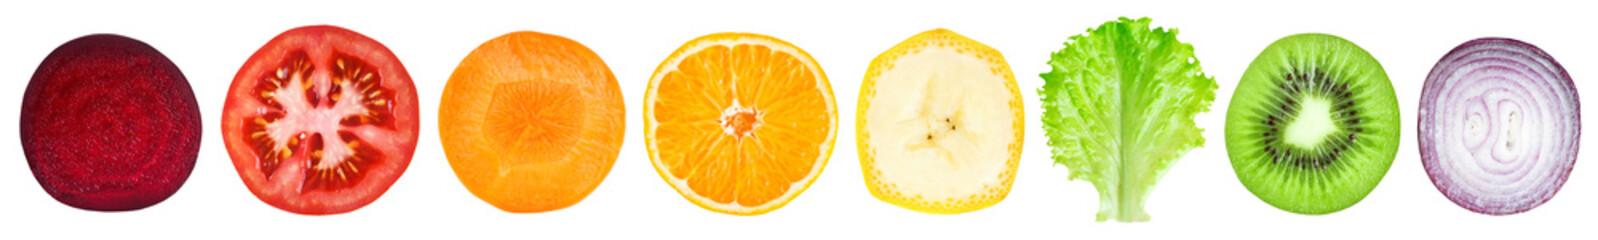 Papiers peints Cuisine Slices of fruit and vegetable